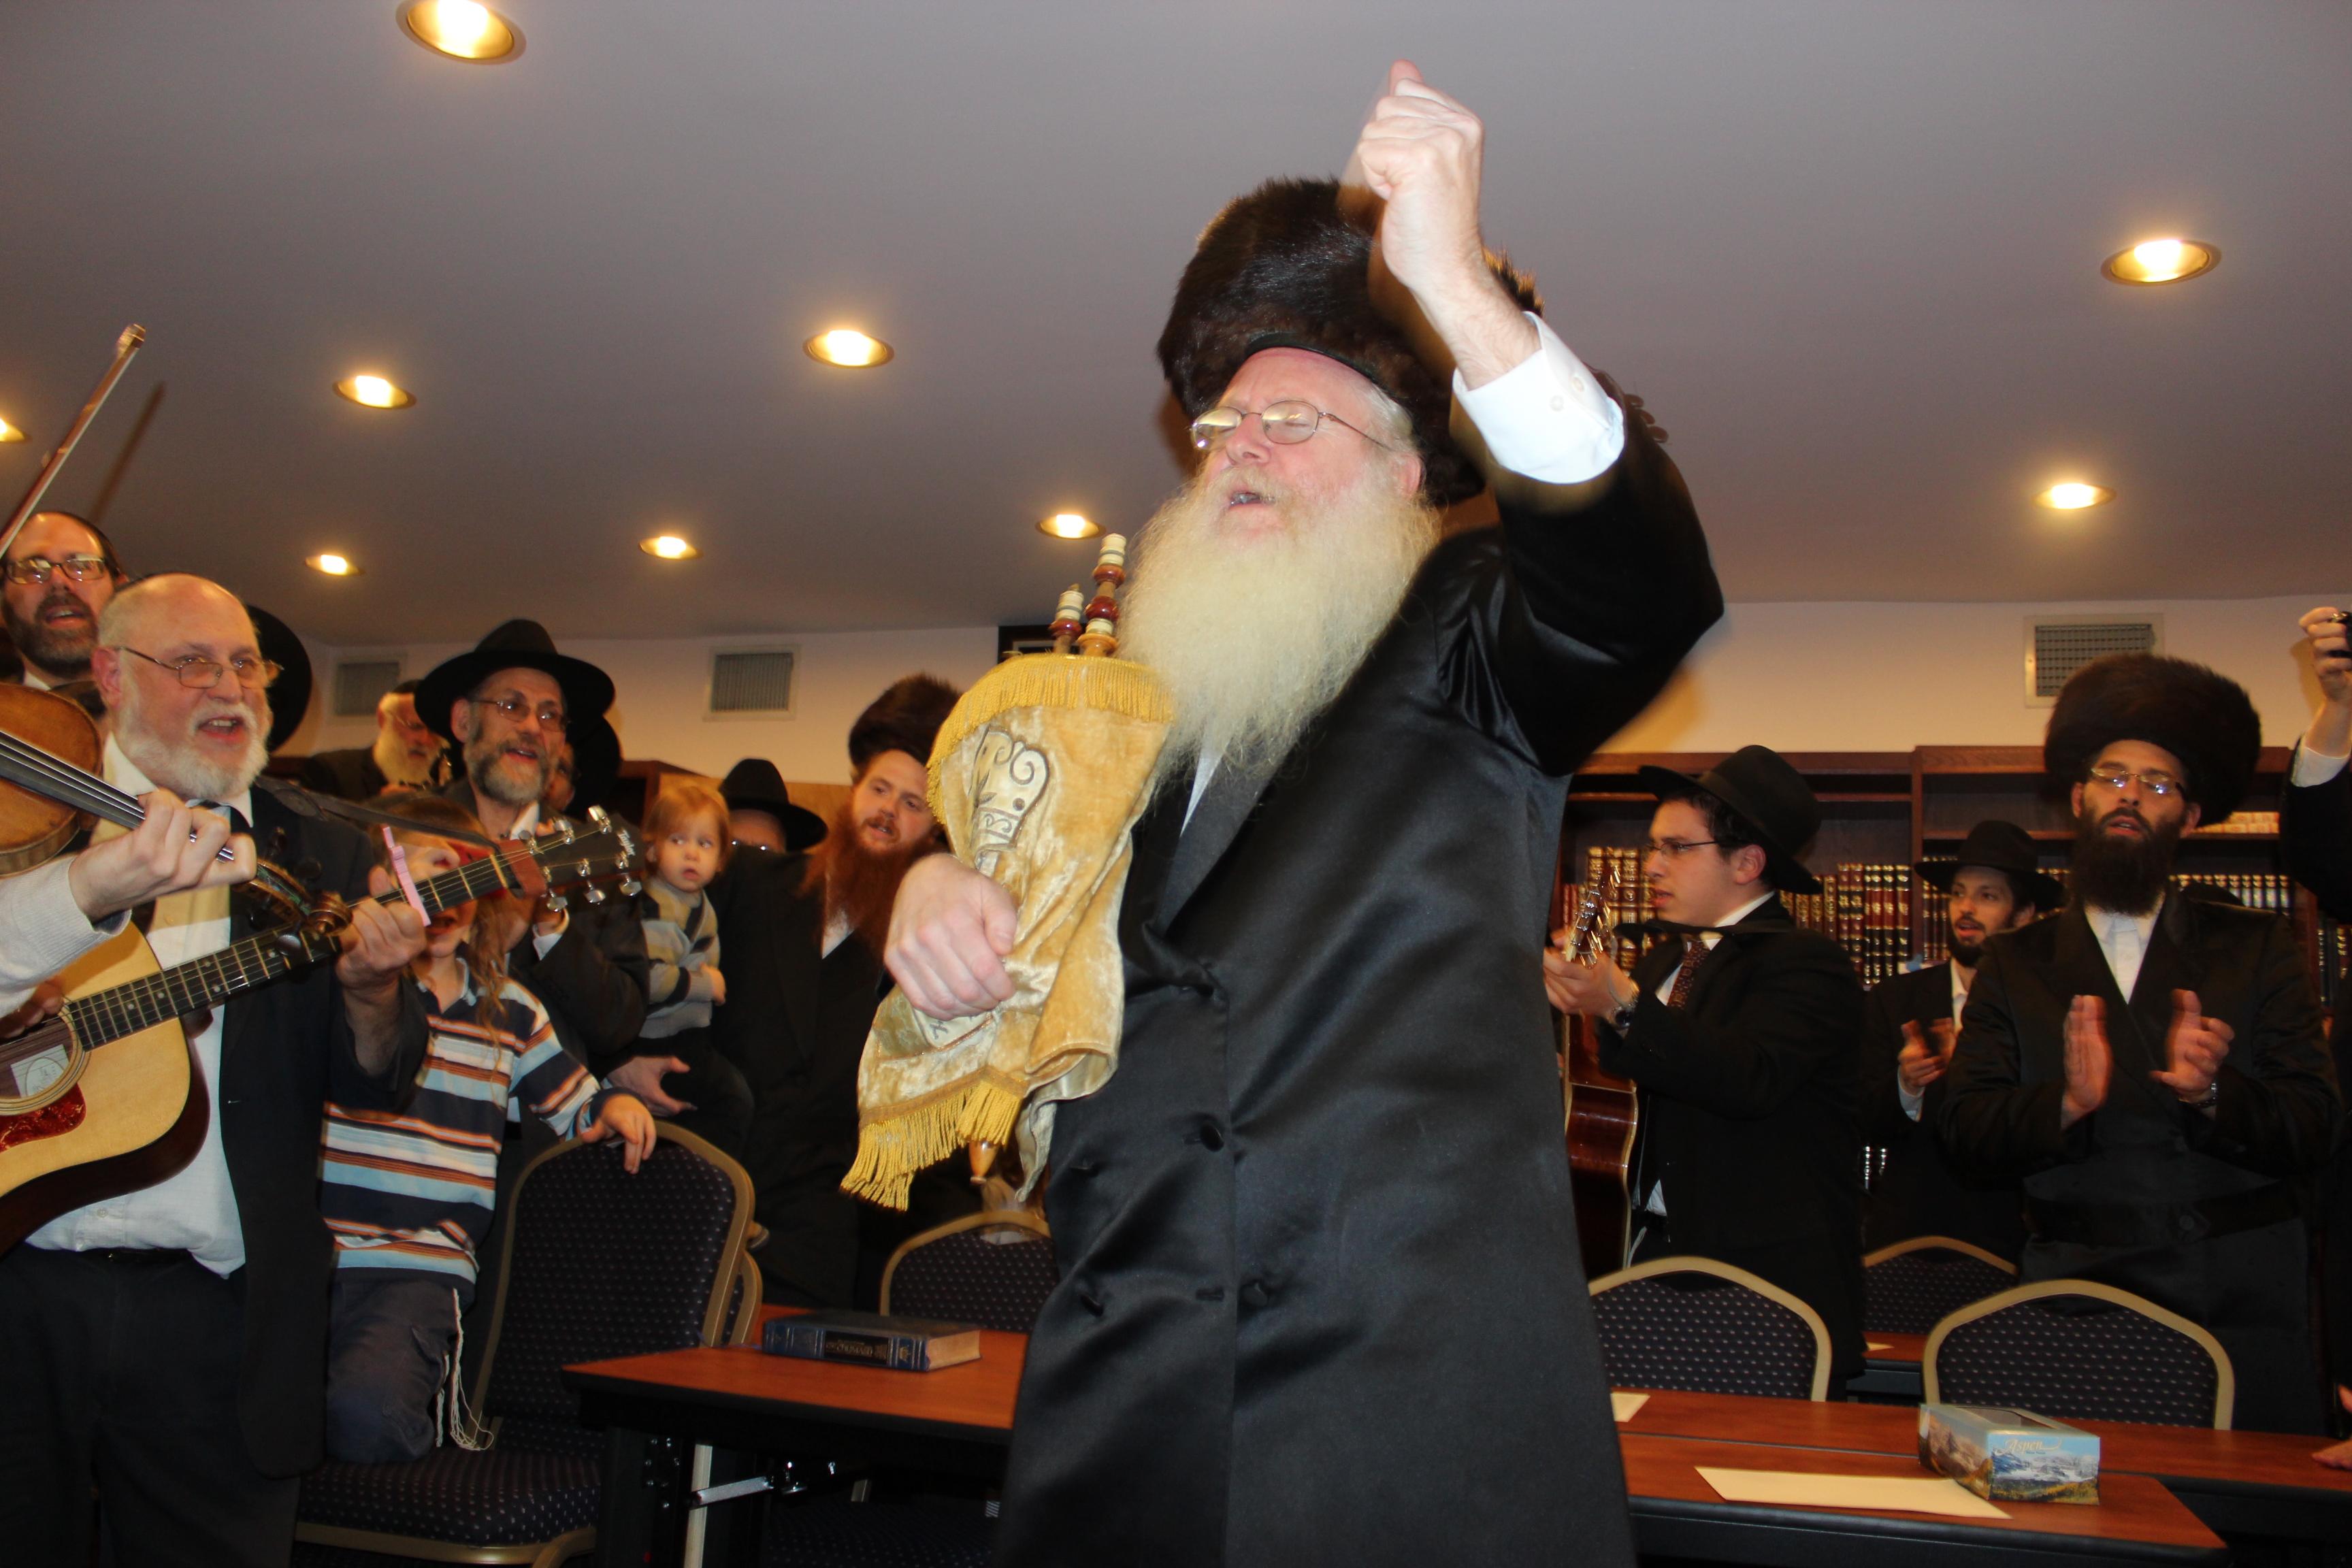 "<span class=""slider_description"">Bais Medrash Dedication - Rabbi Goldberger</span>"